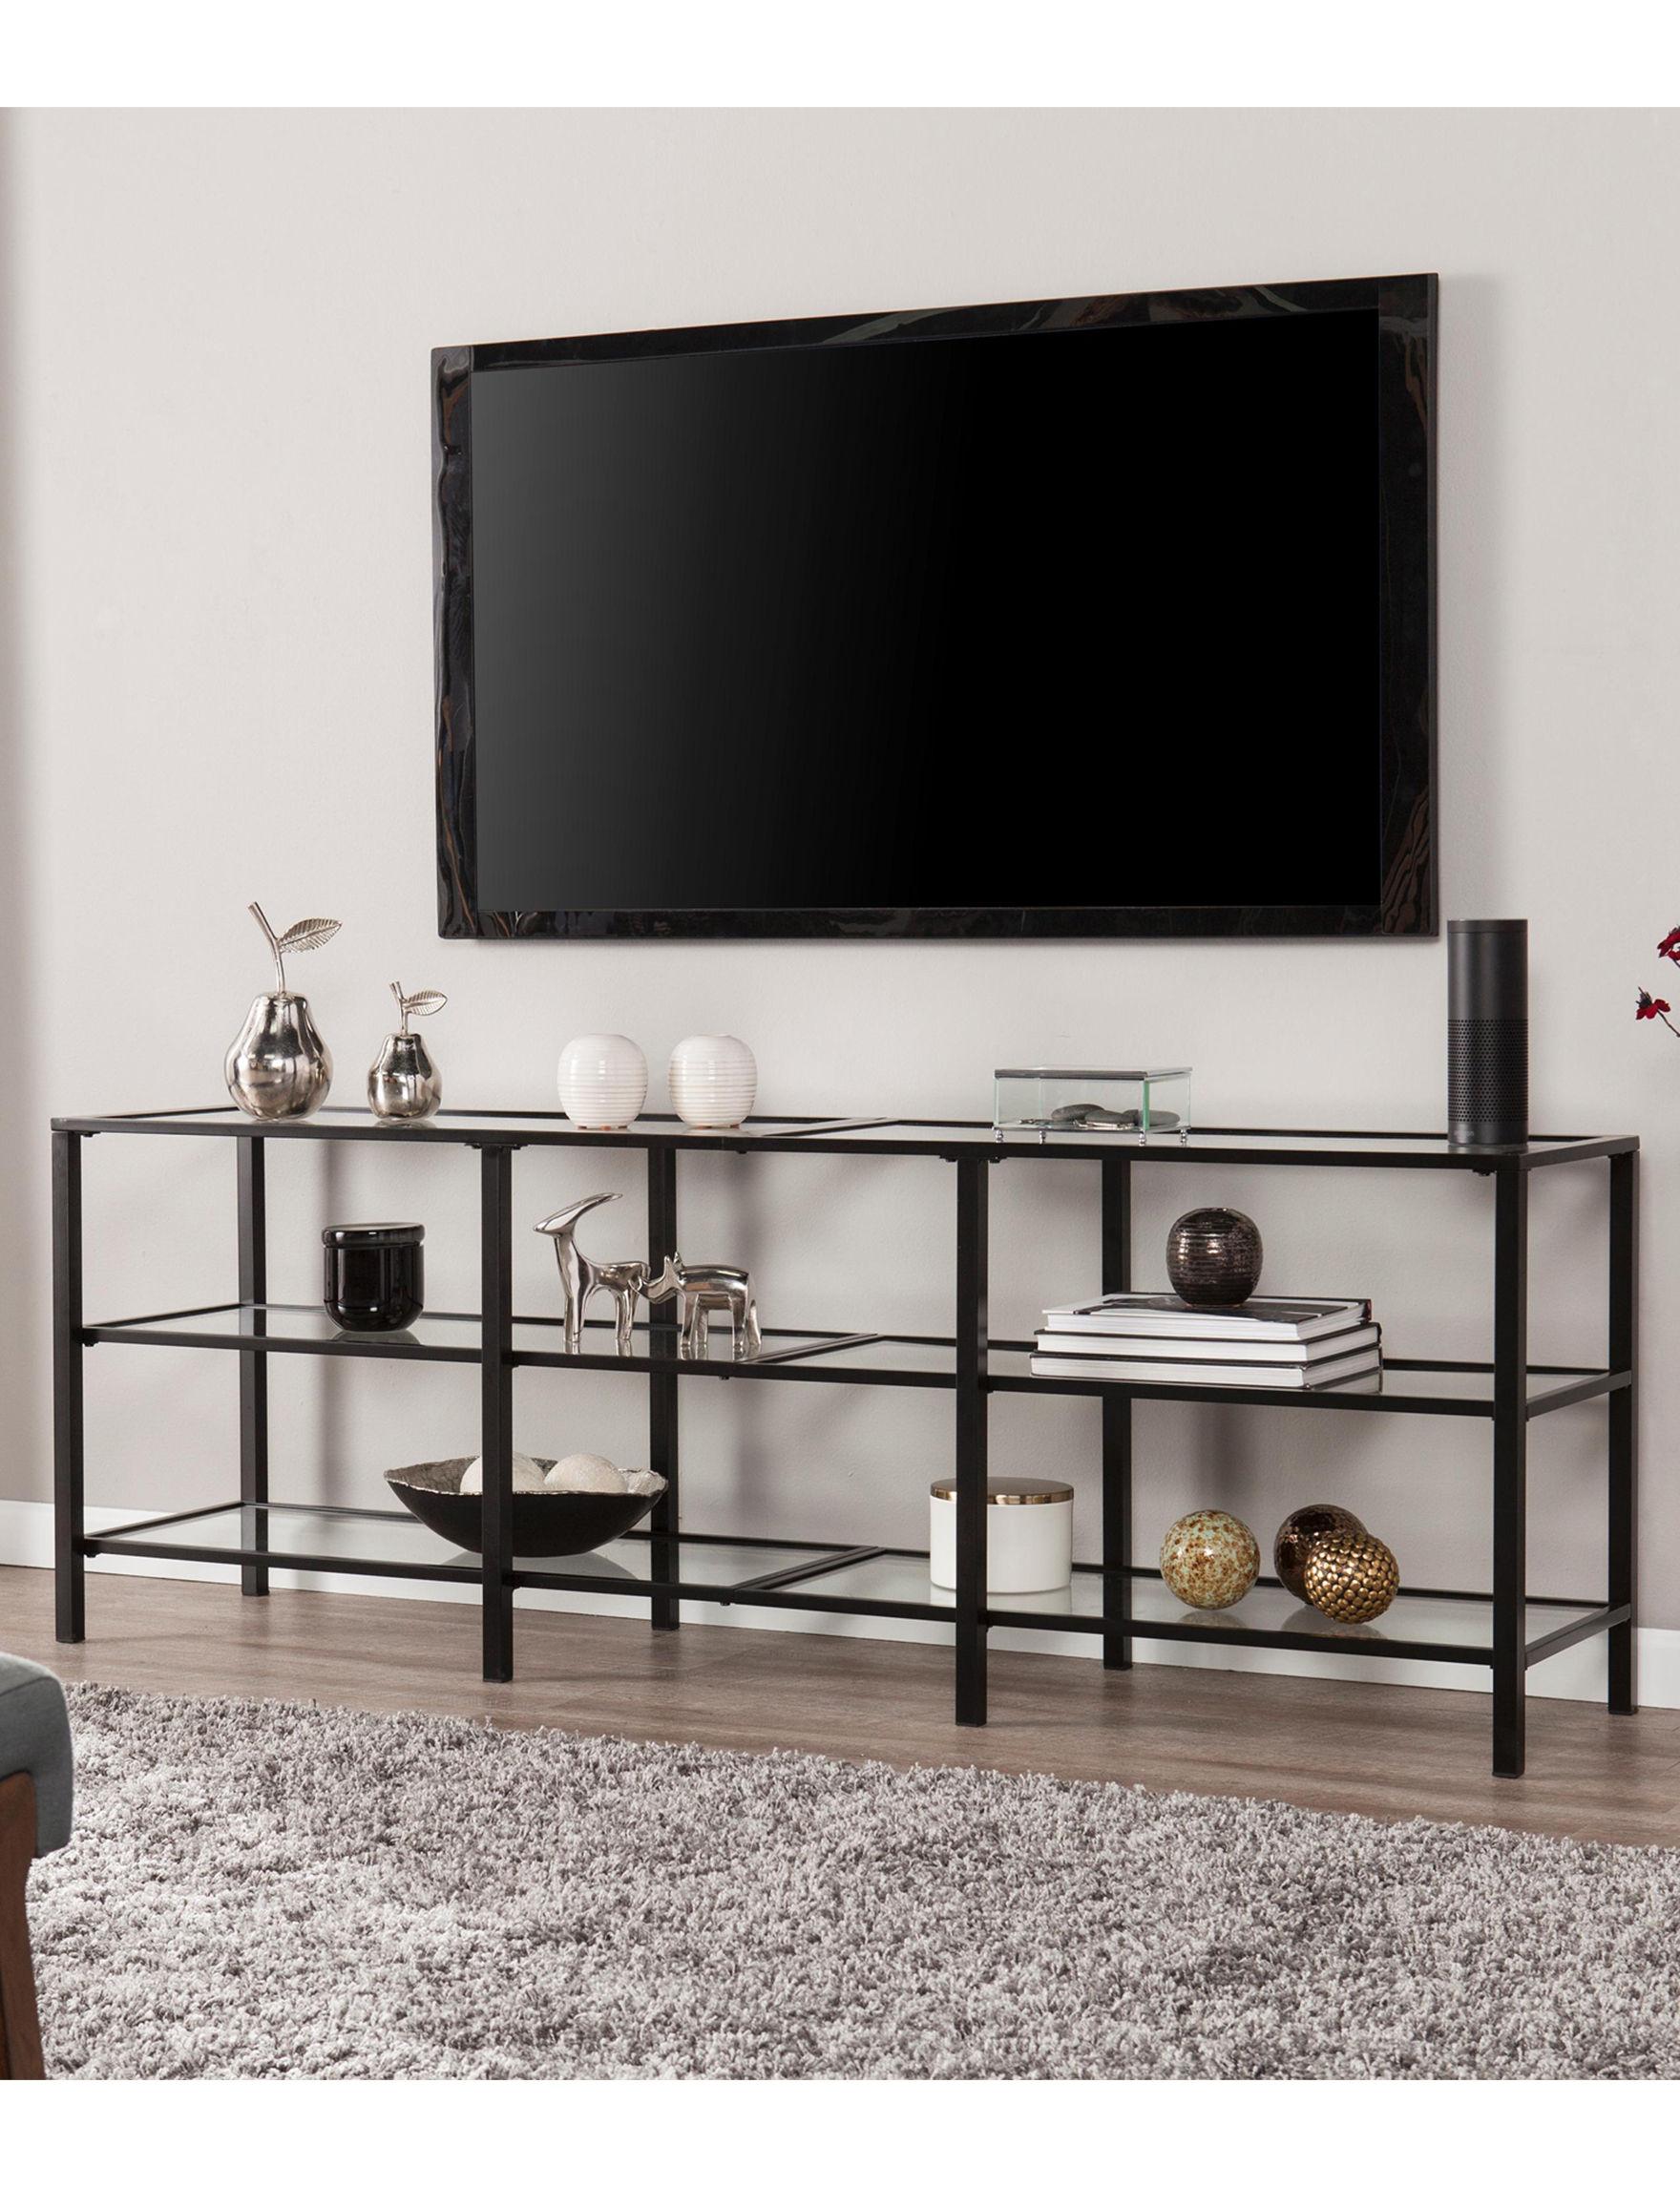 Southern Enterprises Black TV Stands & Entertainment Centers Game Room Living Room Furniture